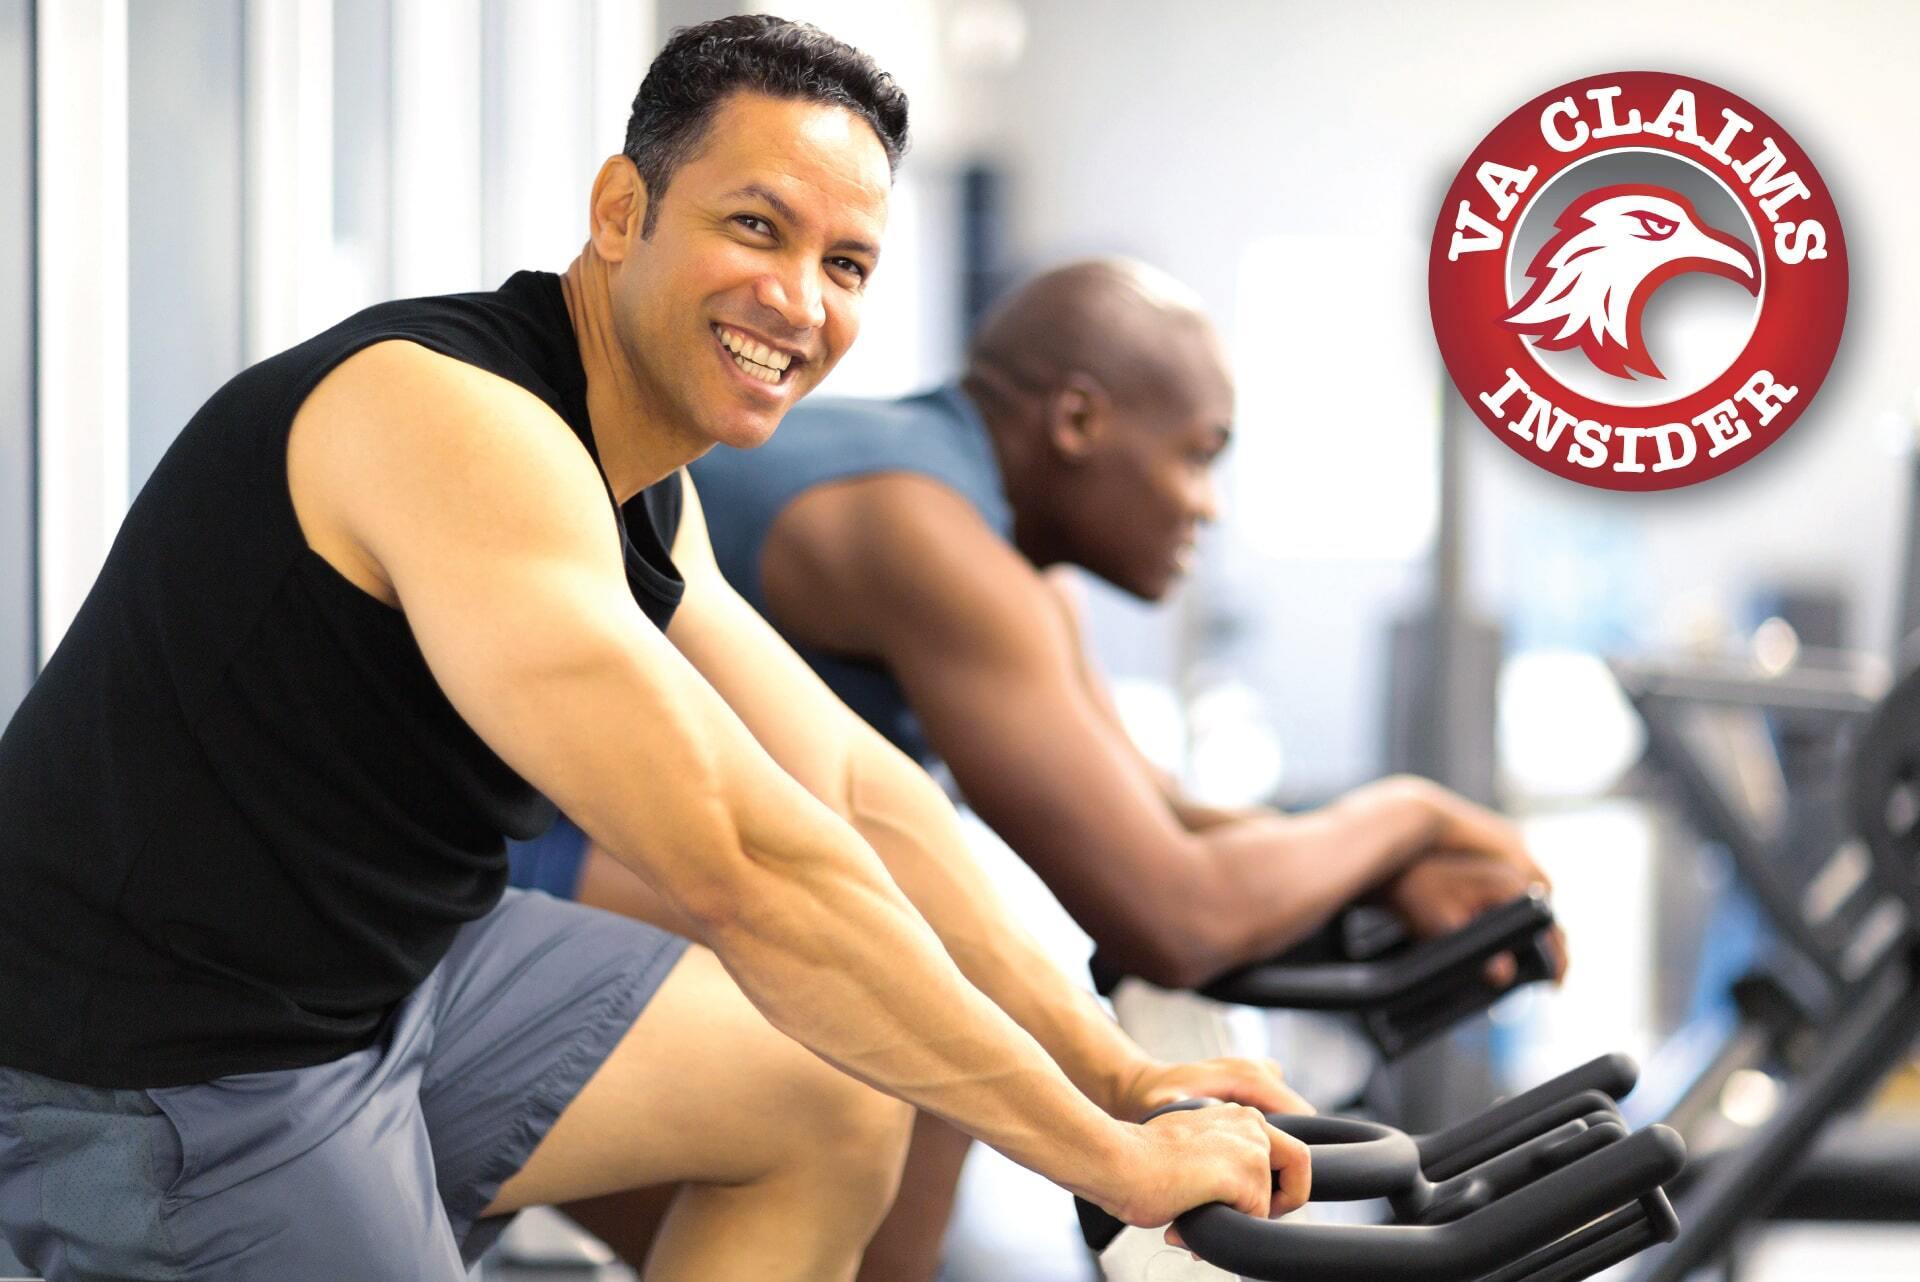 Fitness Sports and Entertainment Veteran Charities